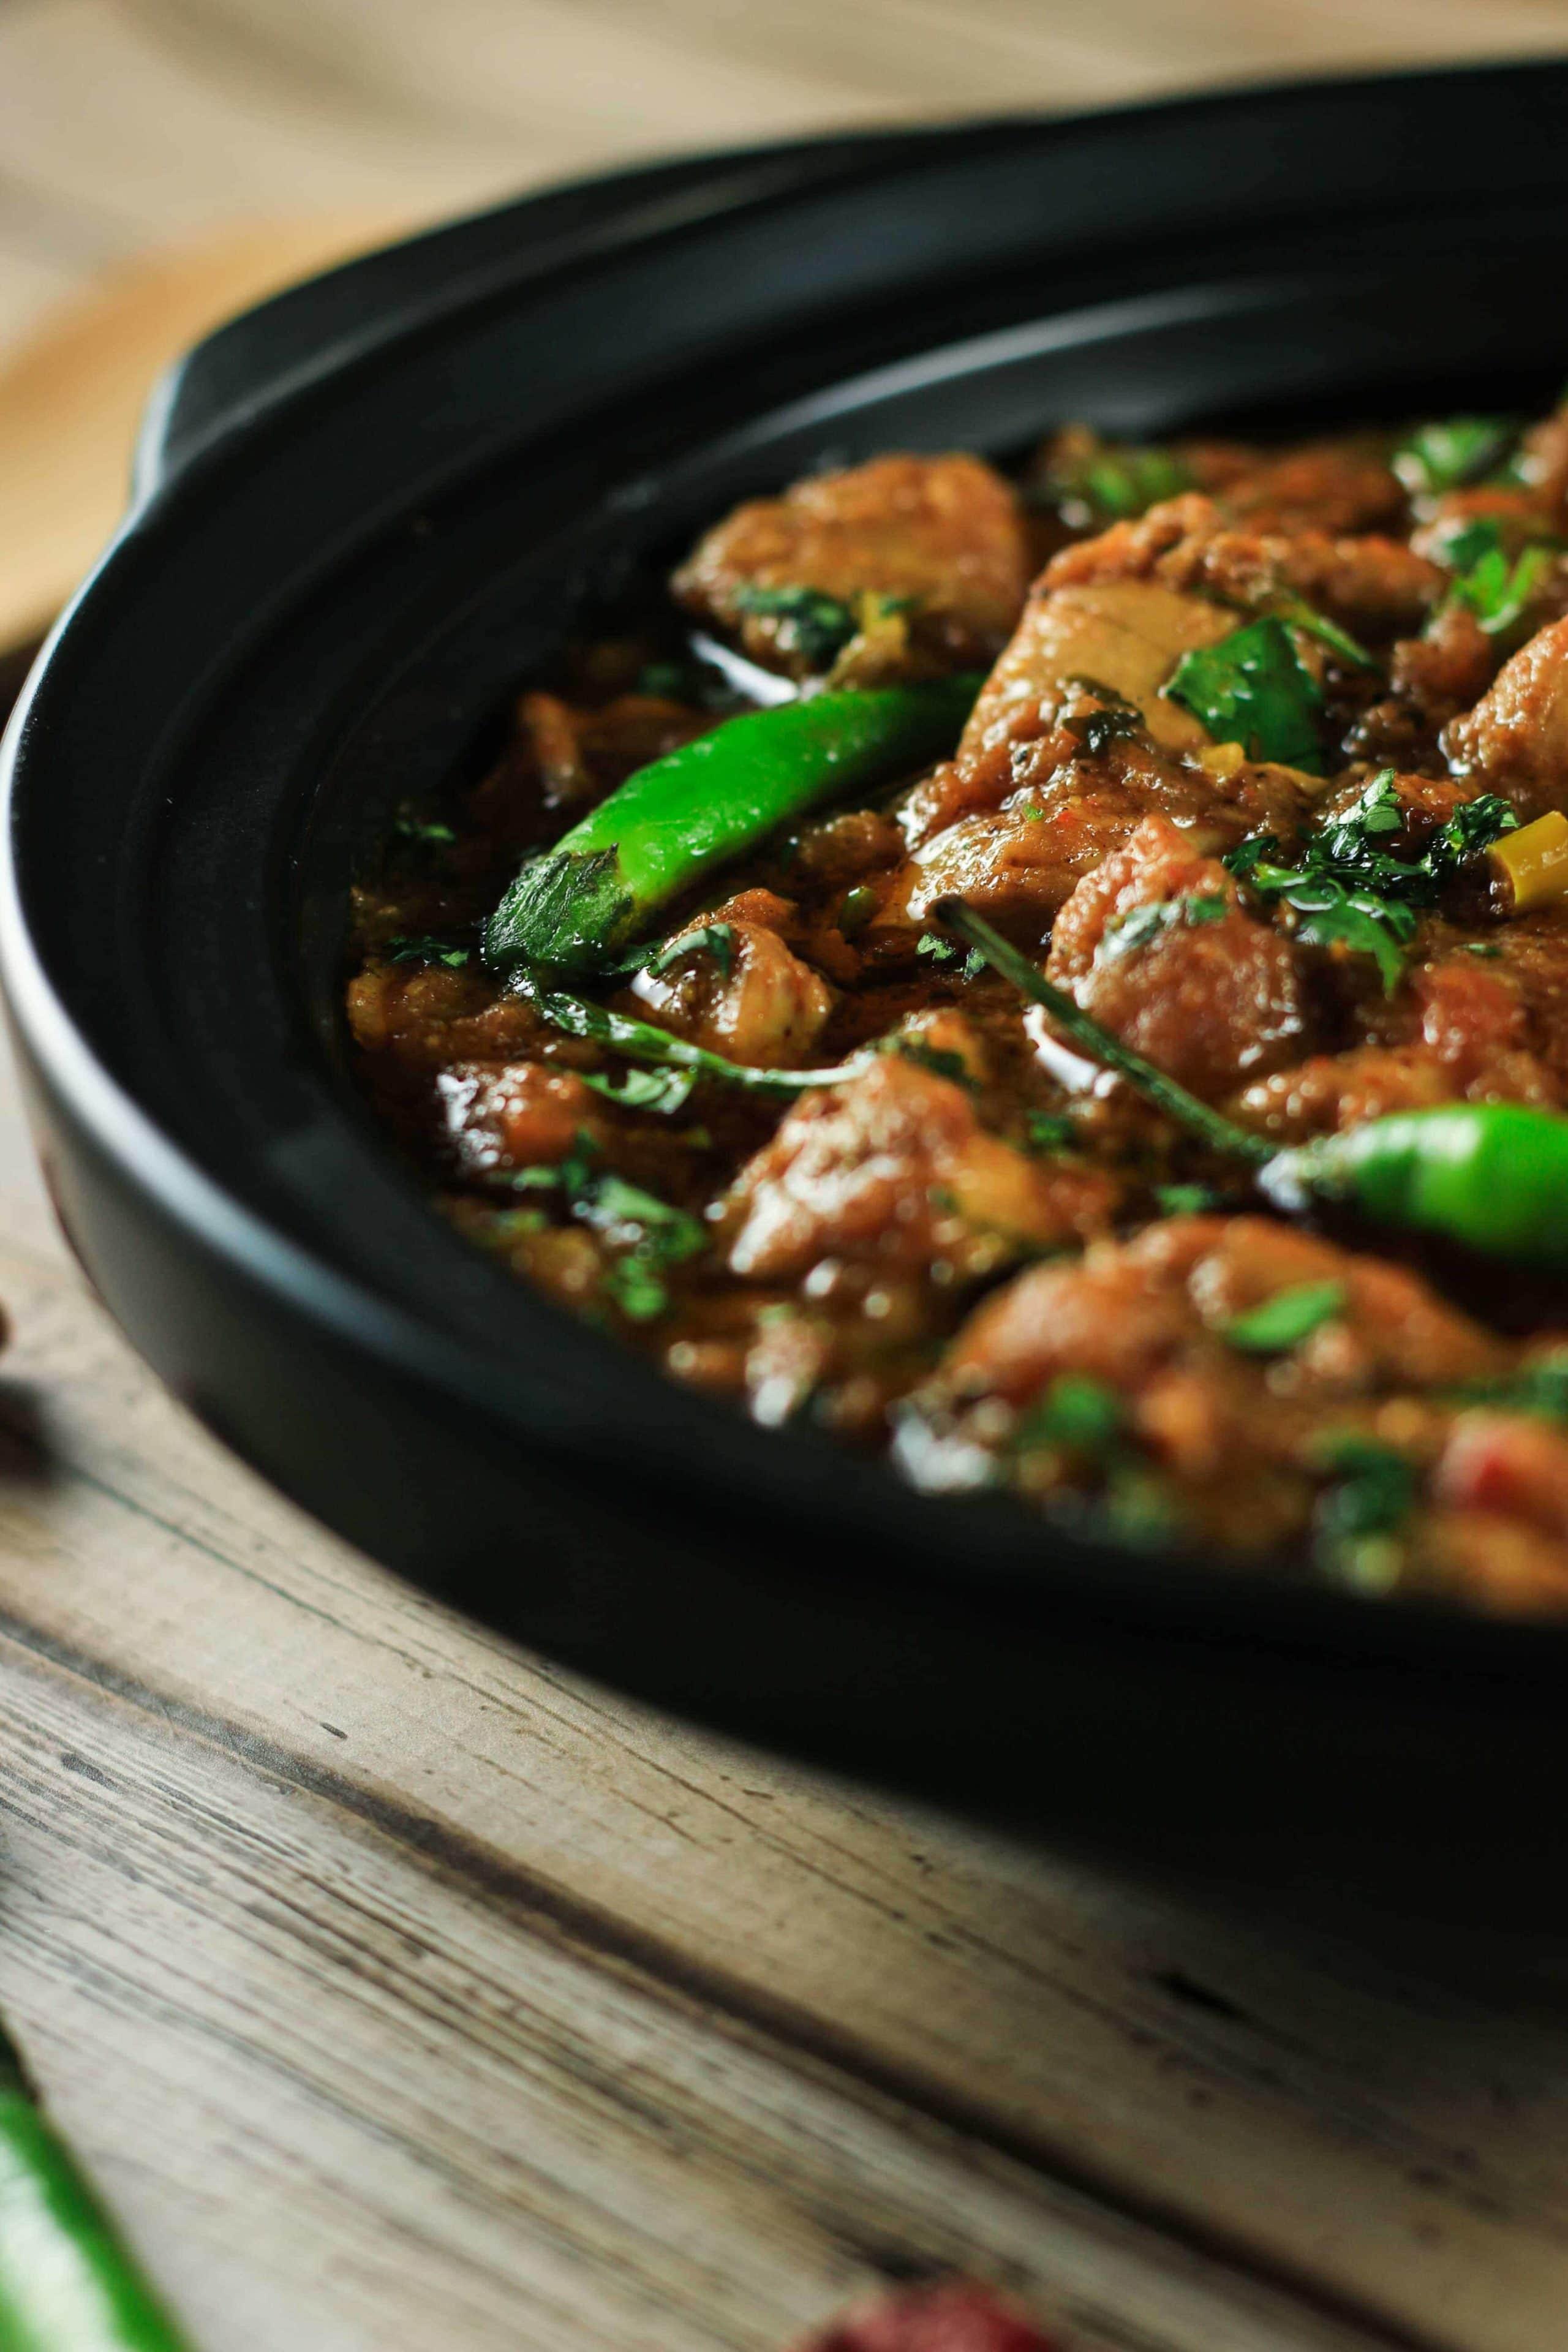 Chicken karahi in black bowl